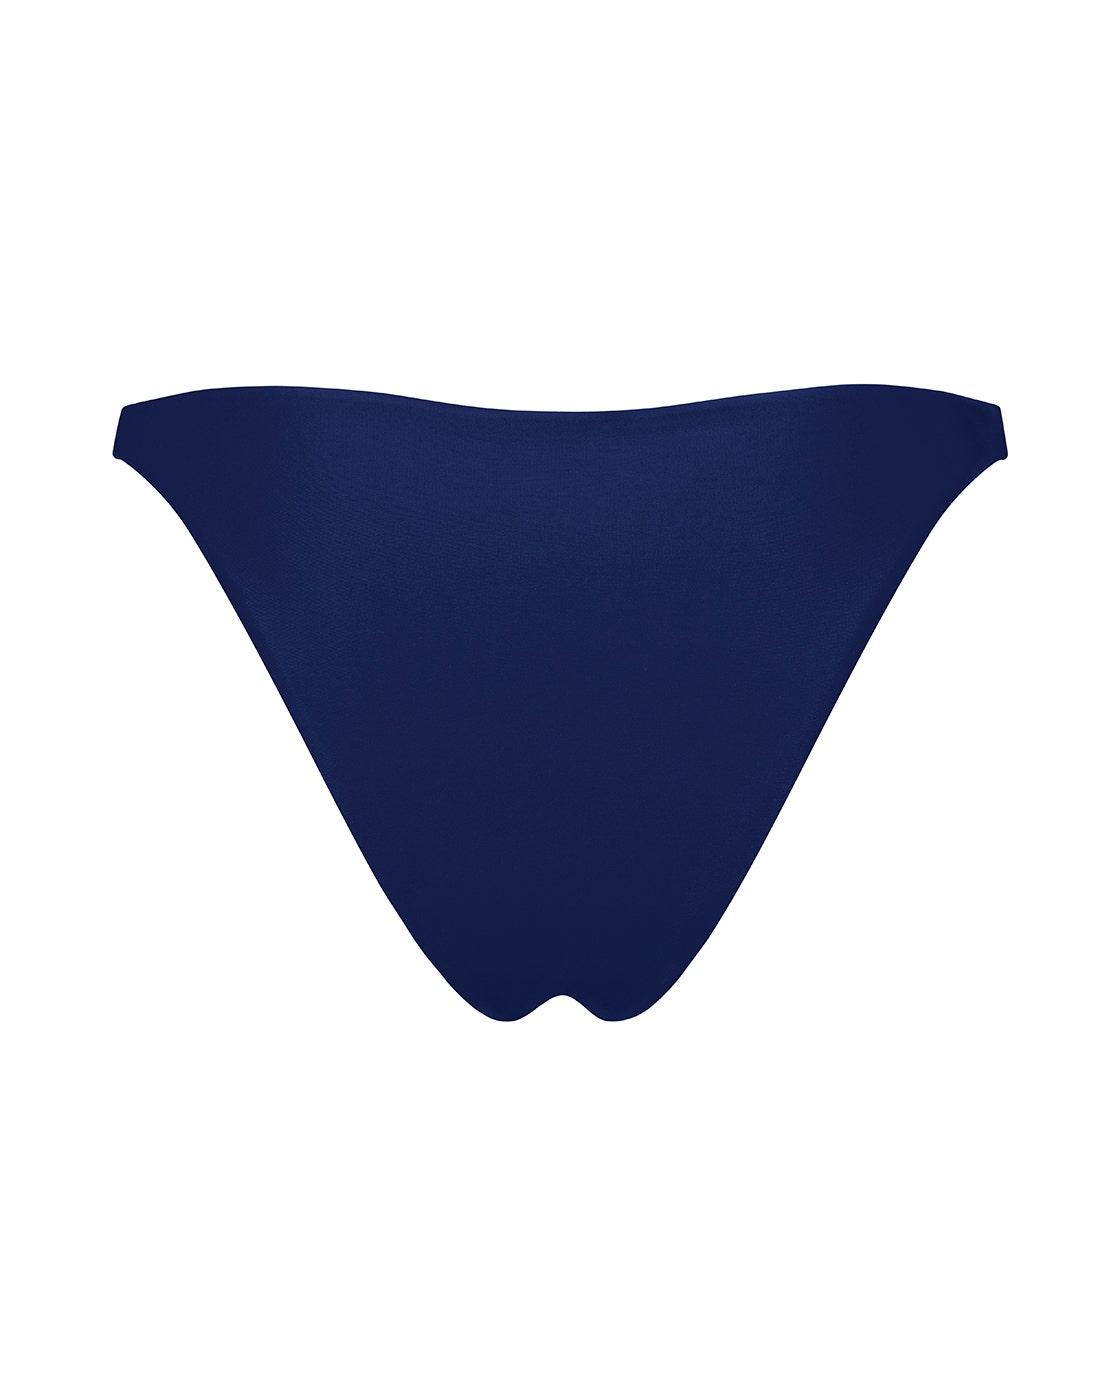 Navy Blue High Waist Bikini Bottoms